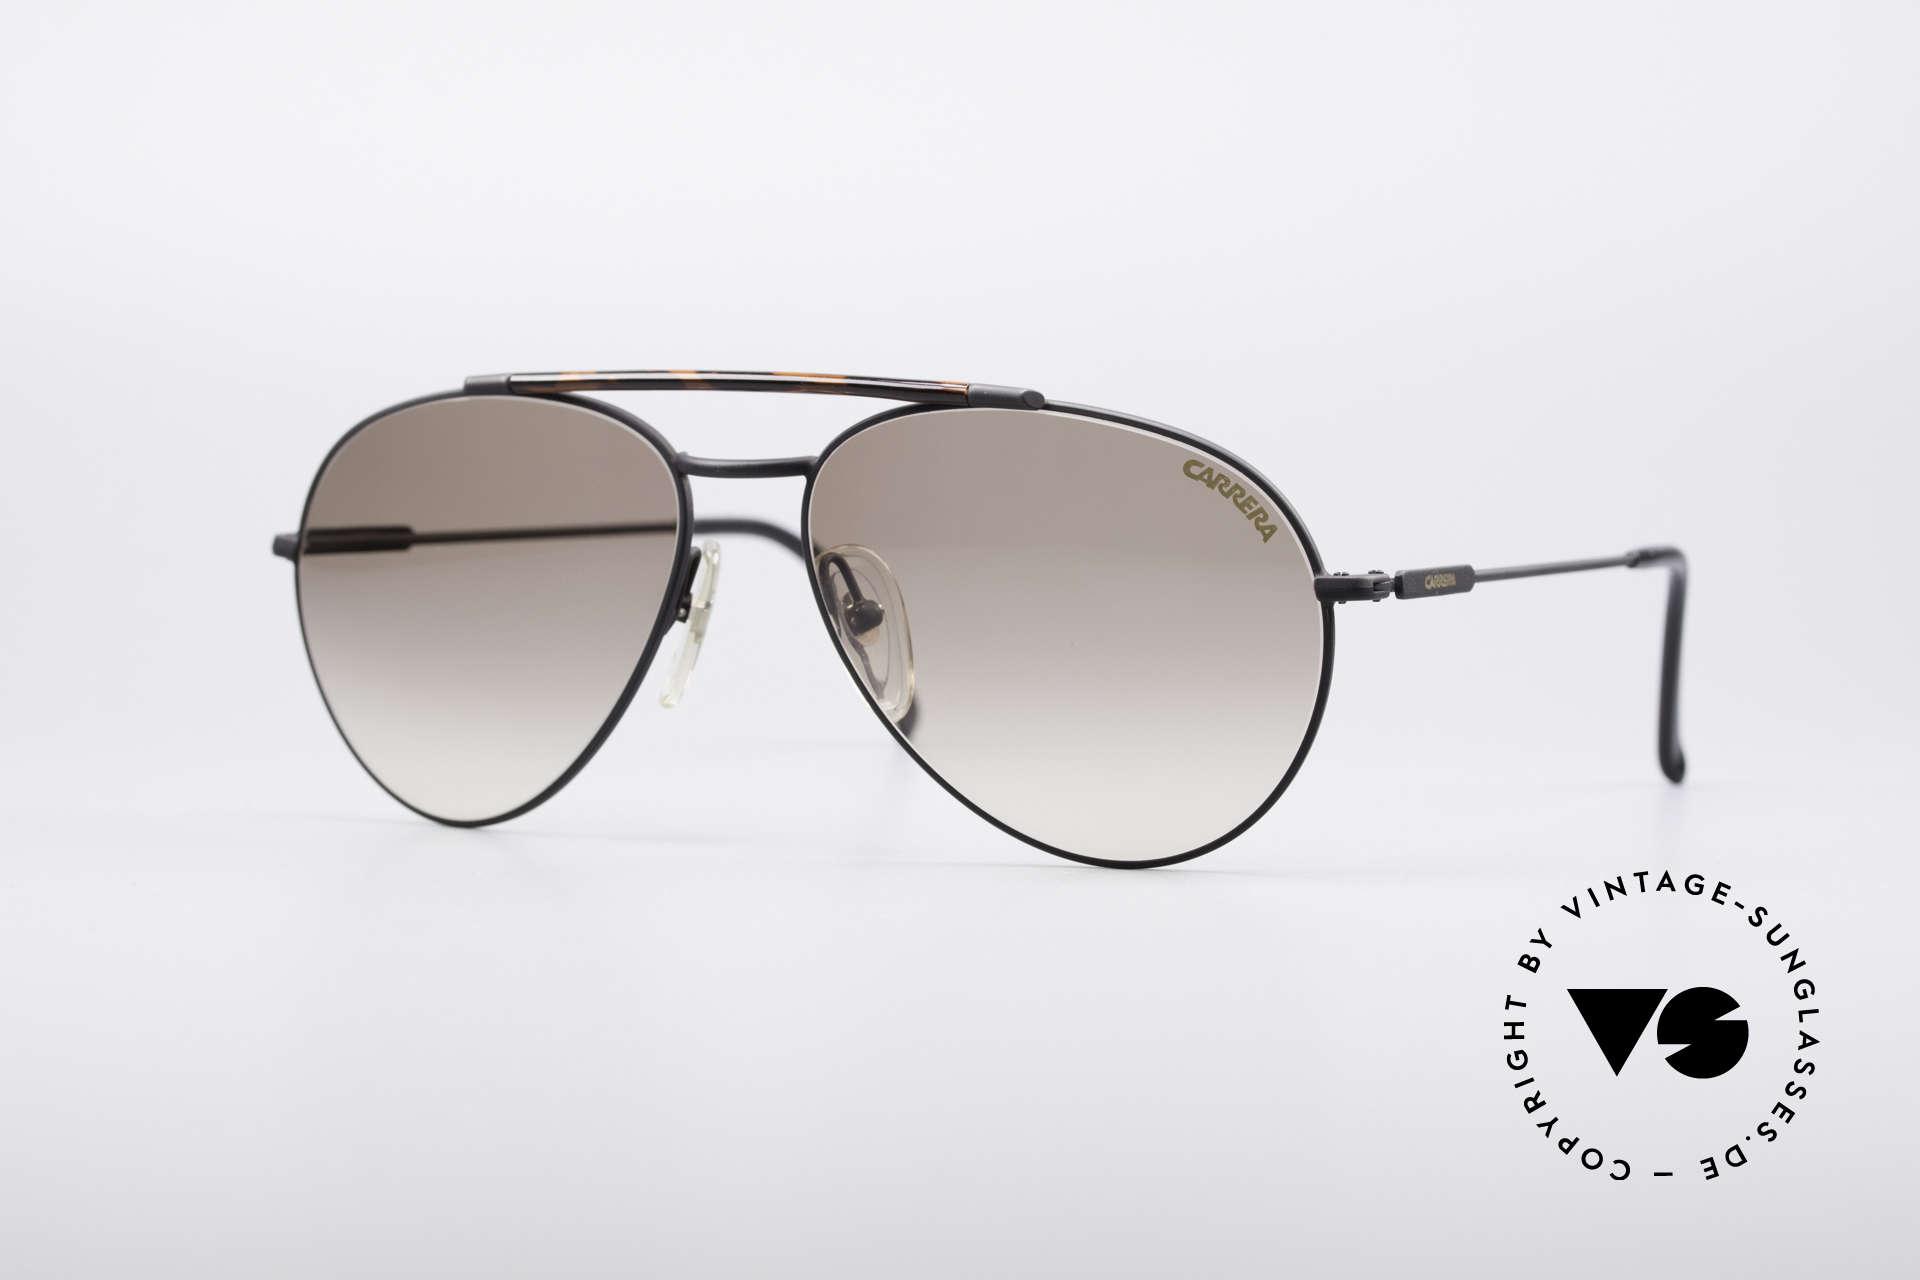 Carrera 5349 True Vintage 80's Shades, classic vintage 80's designer sunglasses by Carrera, Made for Men